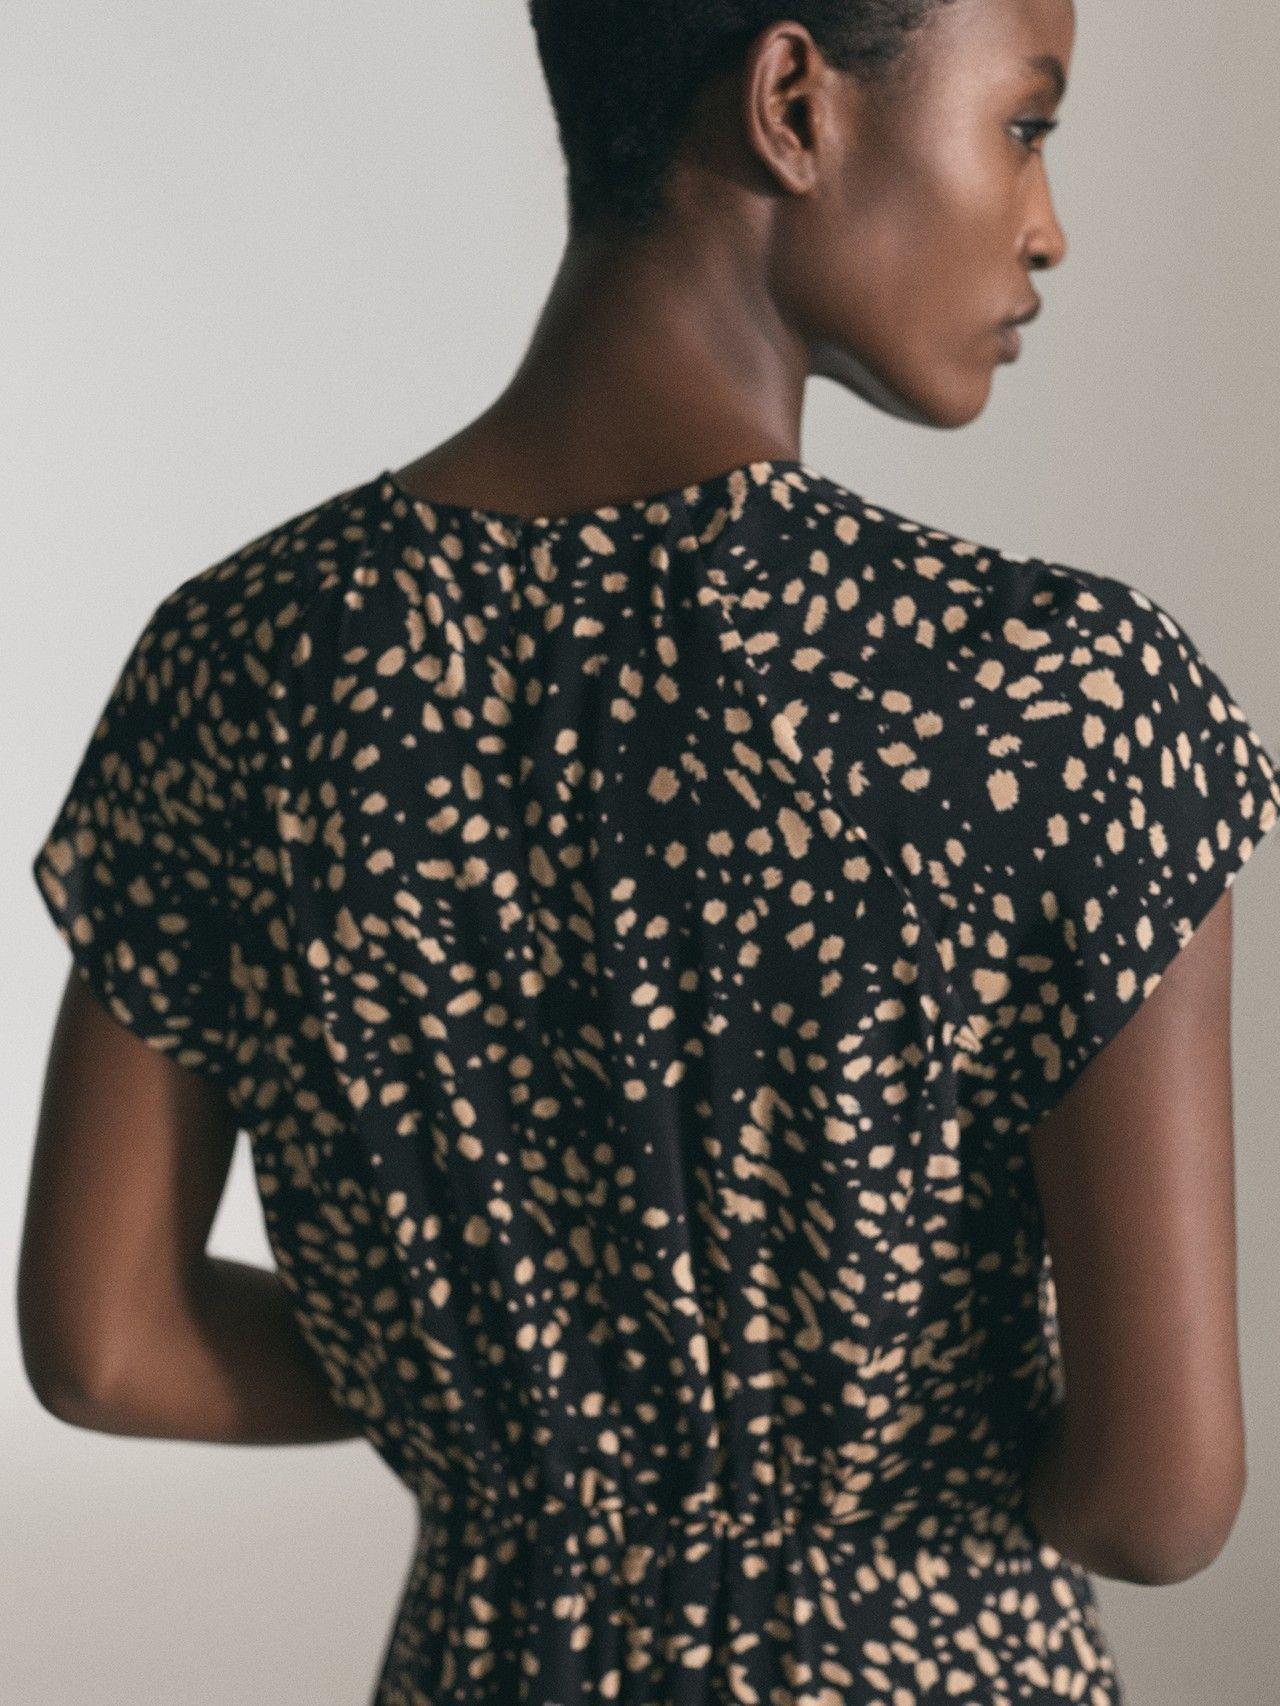 Pin de Araceli Díaz en VeStIdO en 2020   Camisa negra